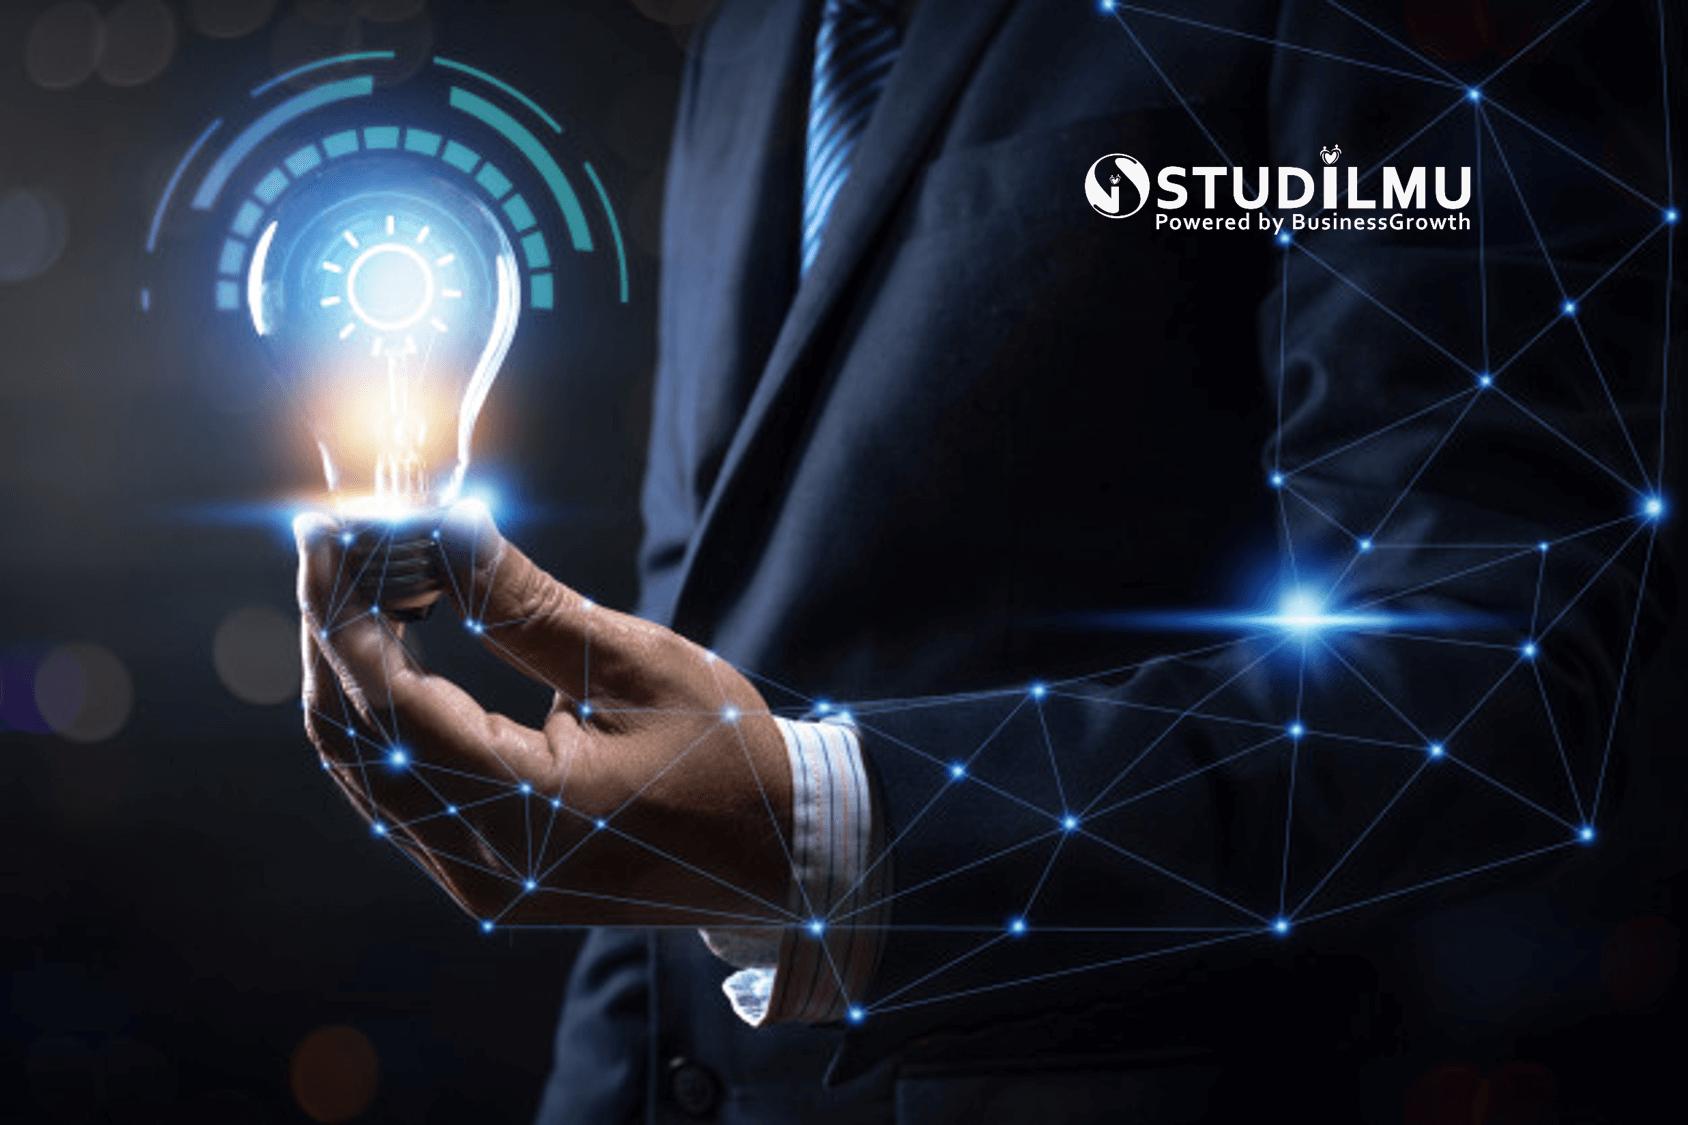 STUDILMU Career Advice - Pengertian Inovasi, Manfaat Inovasi, Tujuan Inovasi dan 5 Mitos Inovasi